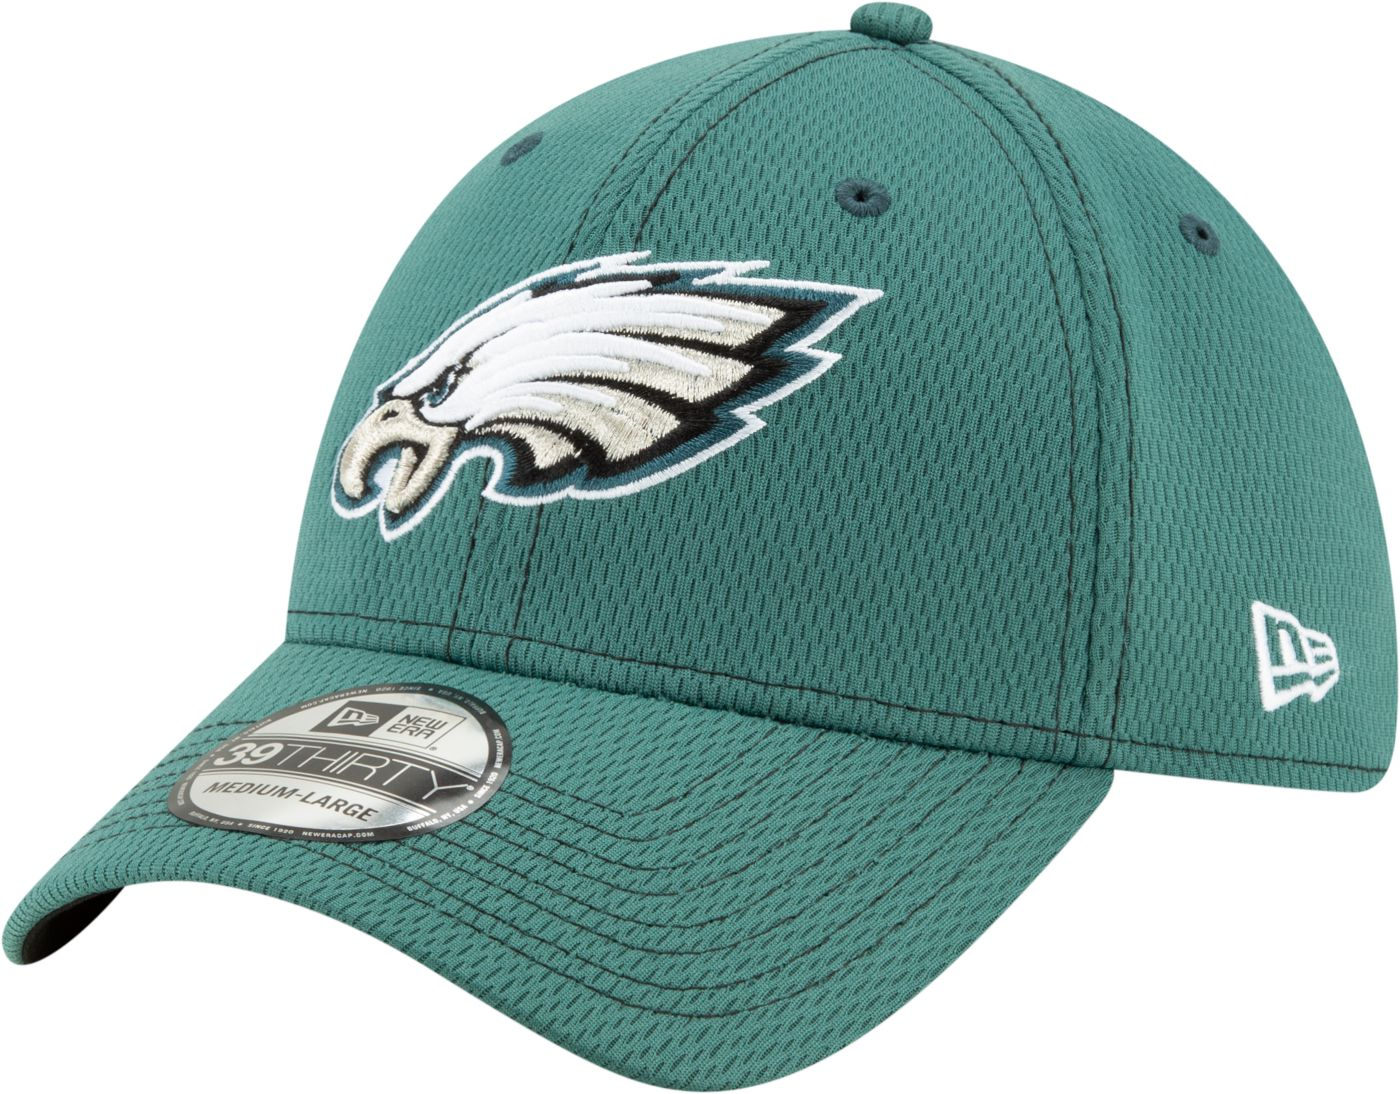 New Era Men's Philadelphia Eagles Sideline Road 39Thirty Stretch Fit Hat